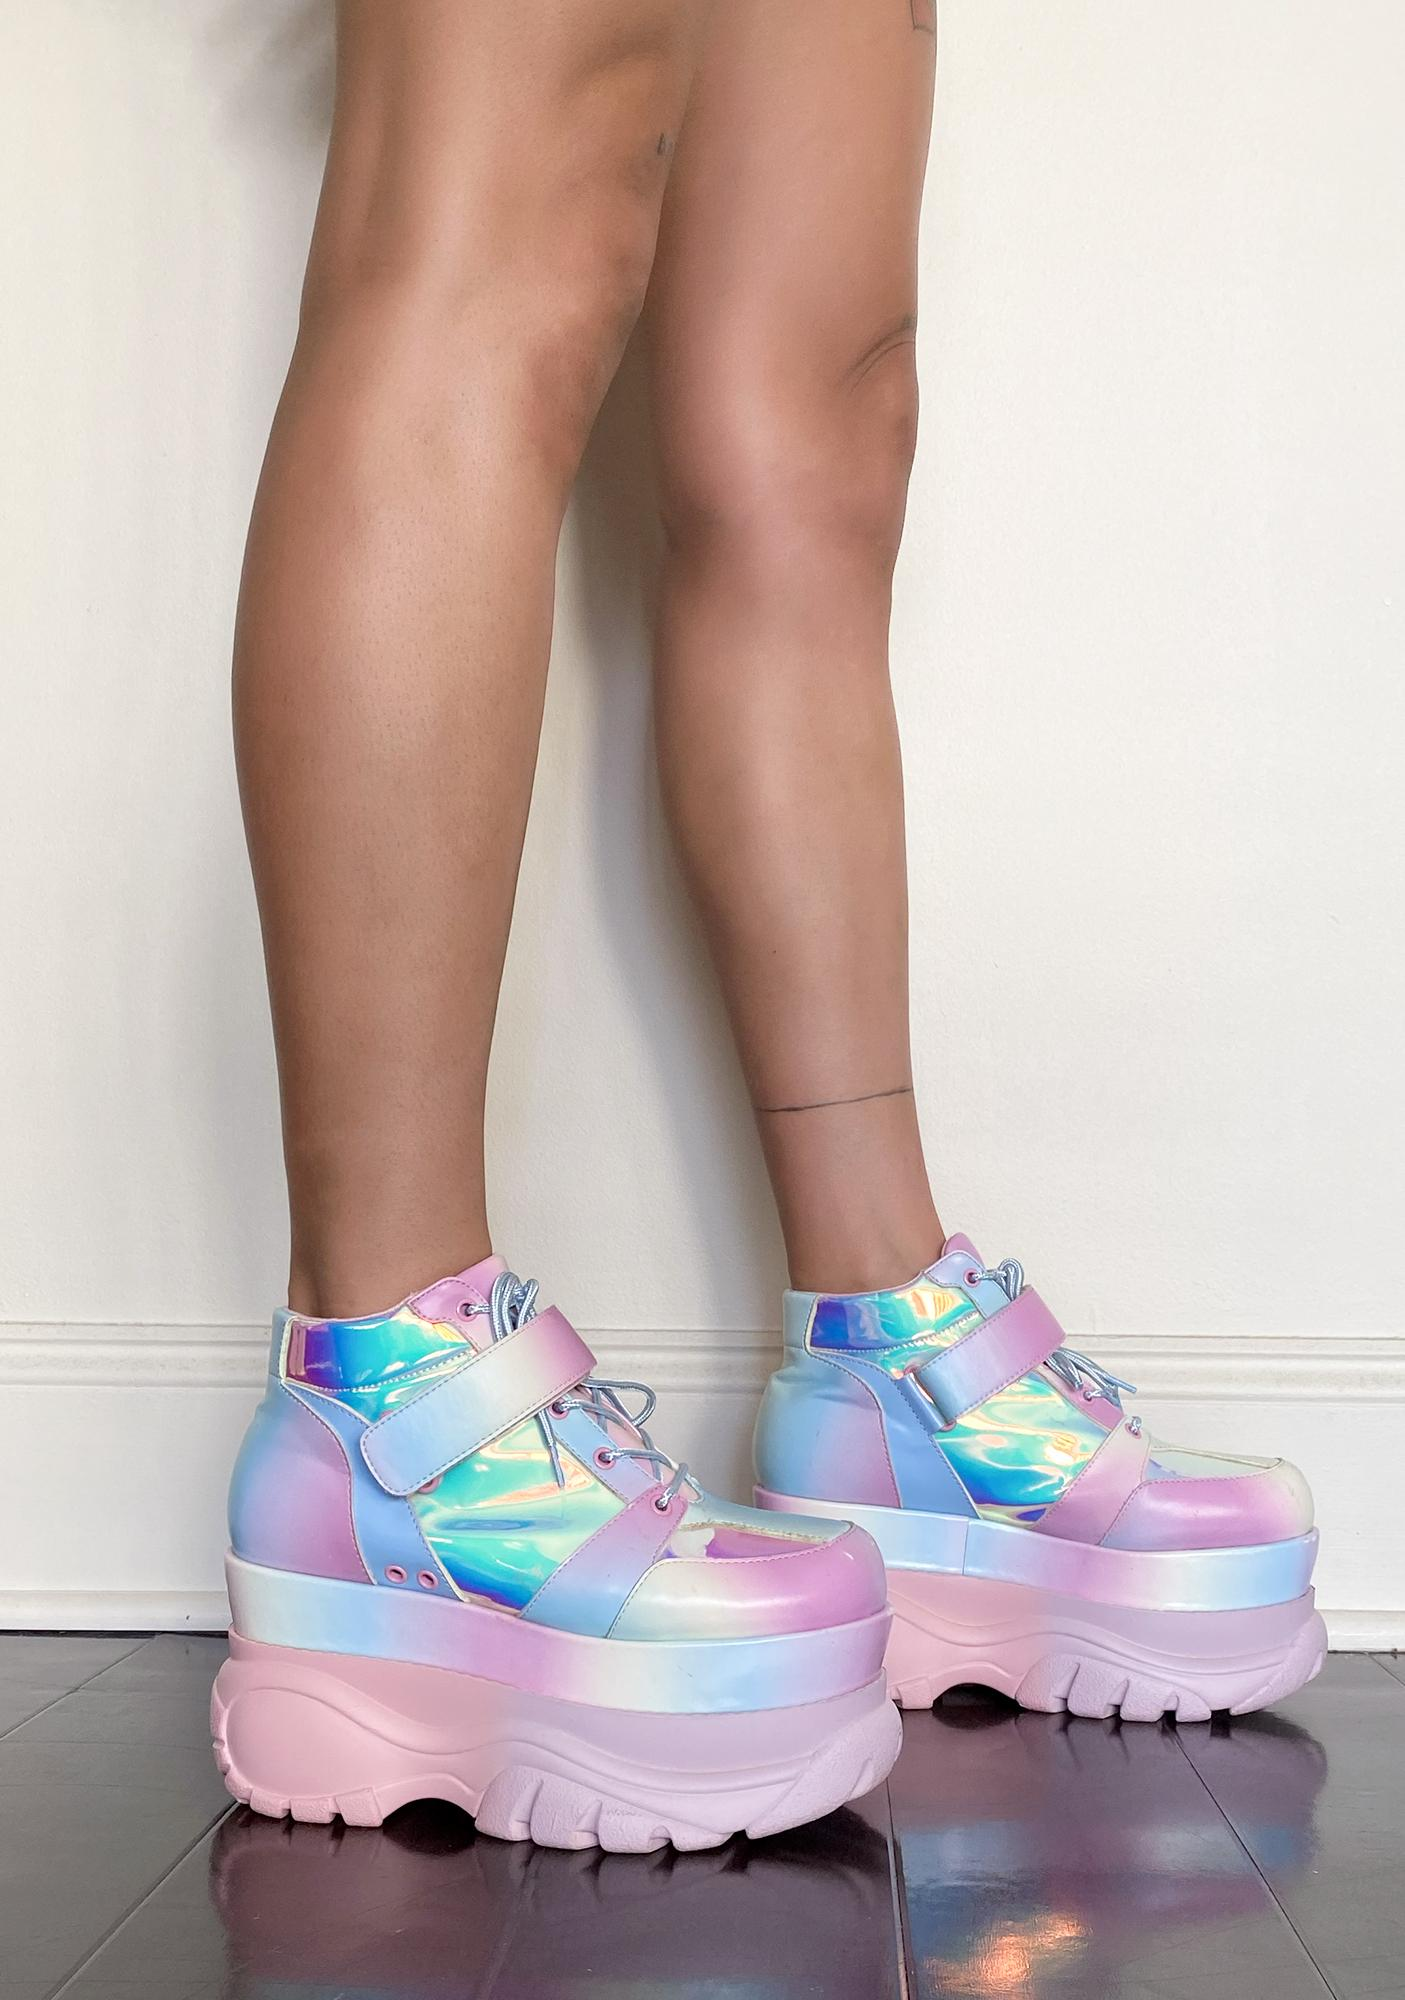 Sugar Thrillz Sugar Shock Platform Sneakers